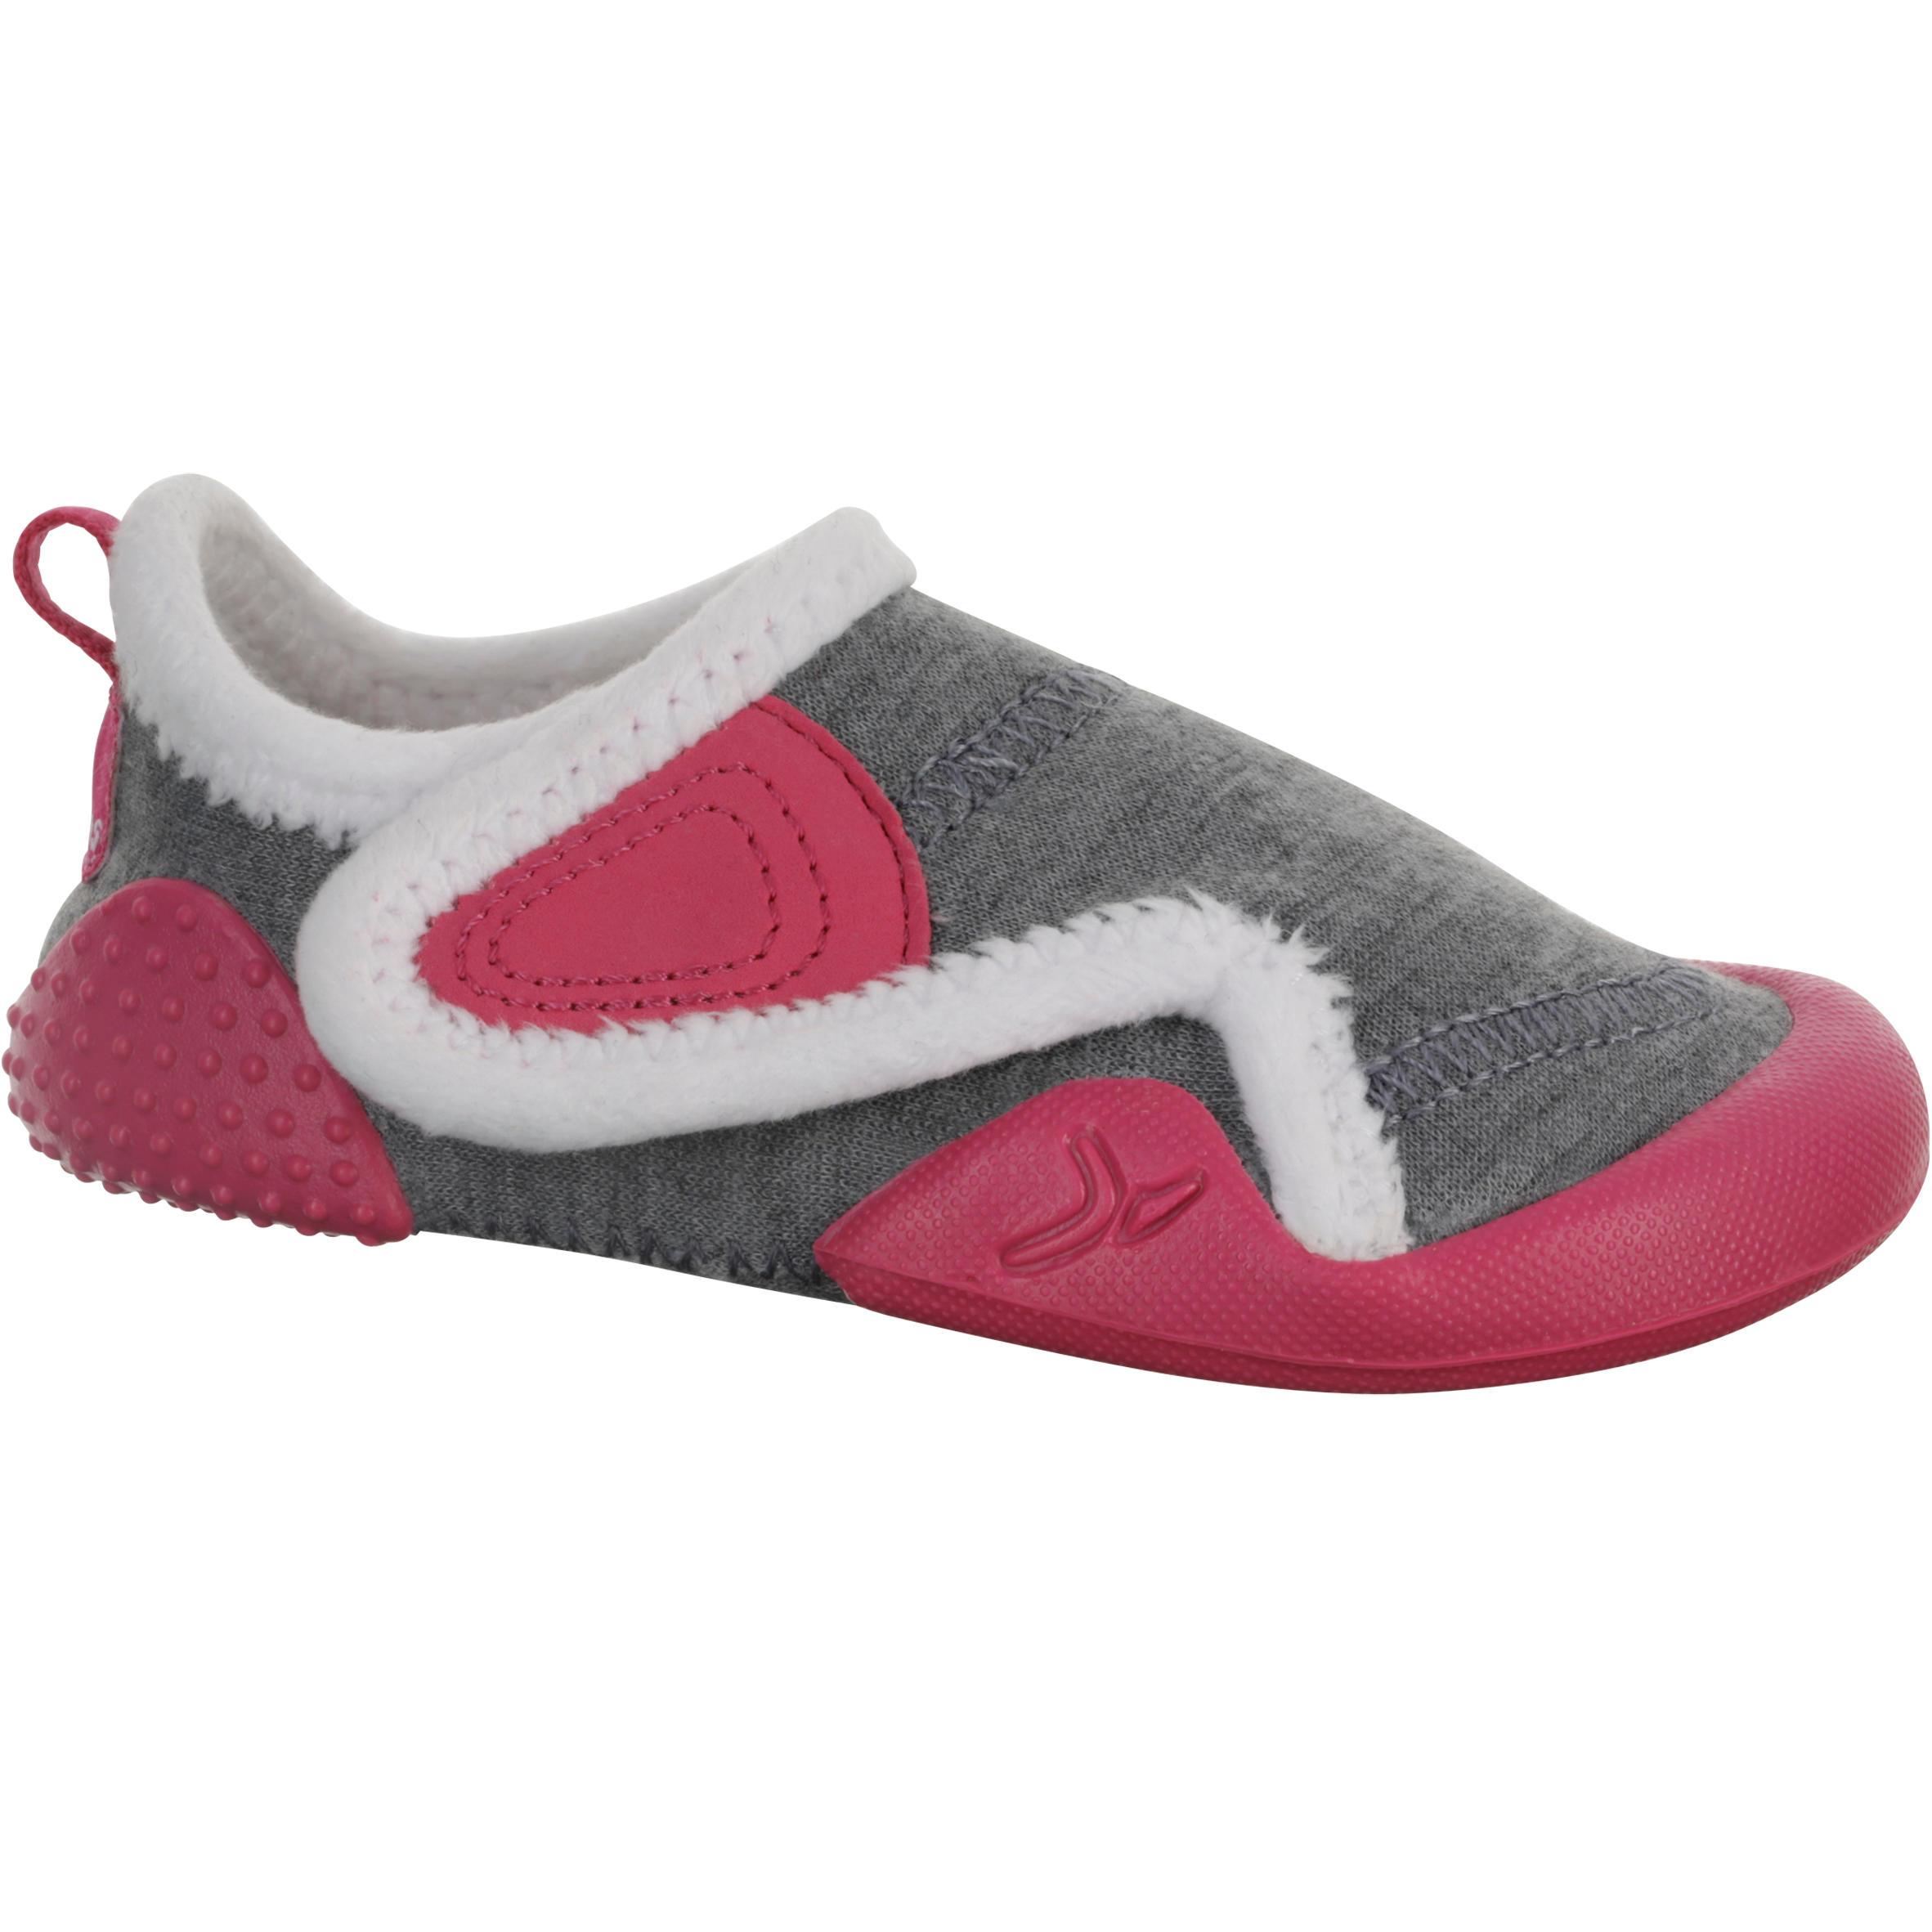 Tenis primeros pasos gimnasia infantil BABYLIGHT gris/rosa forro blanco